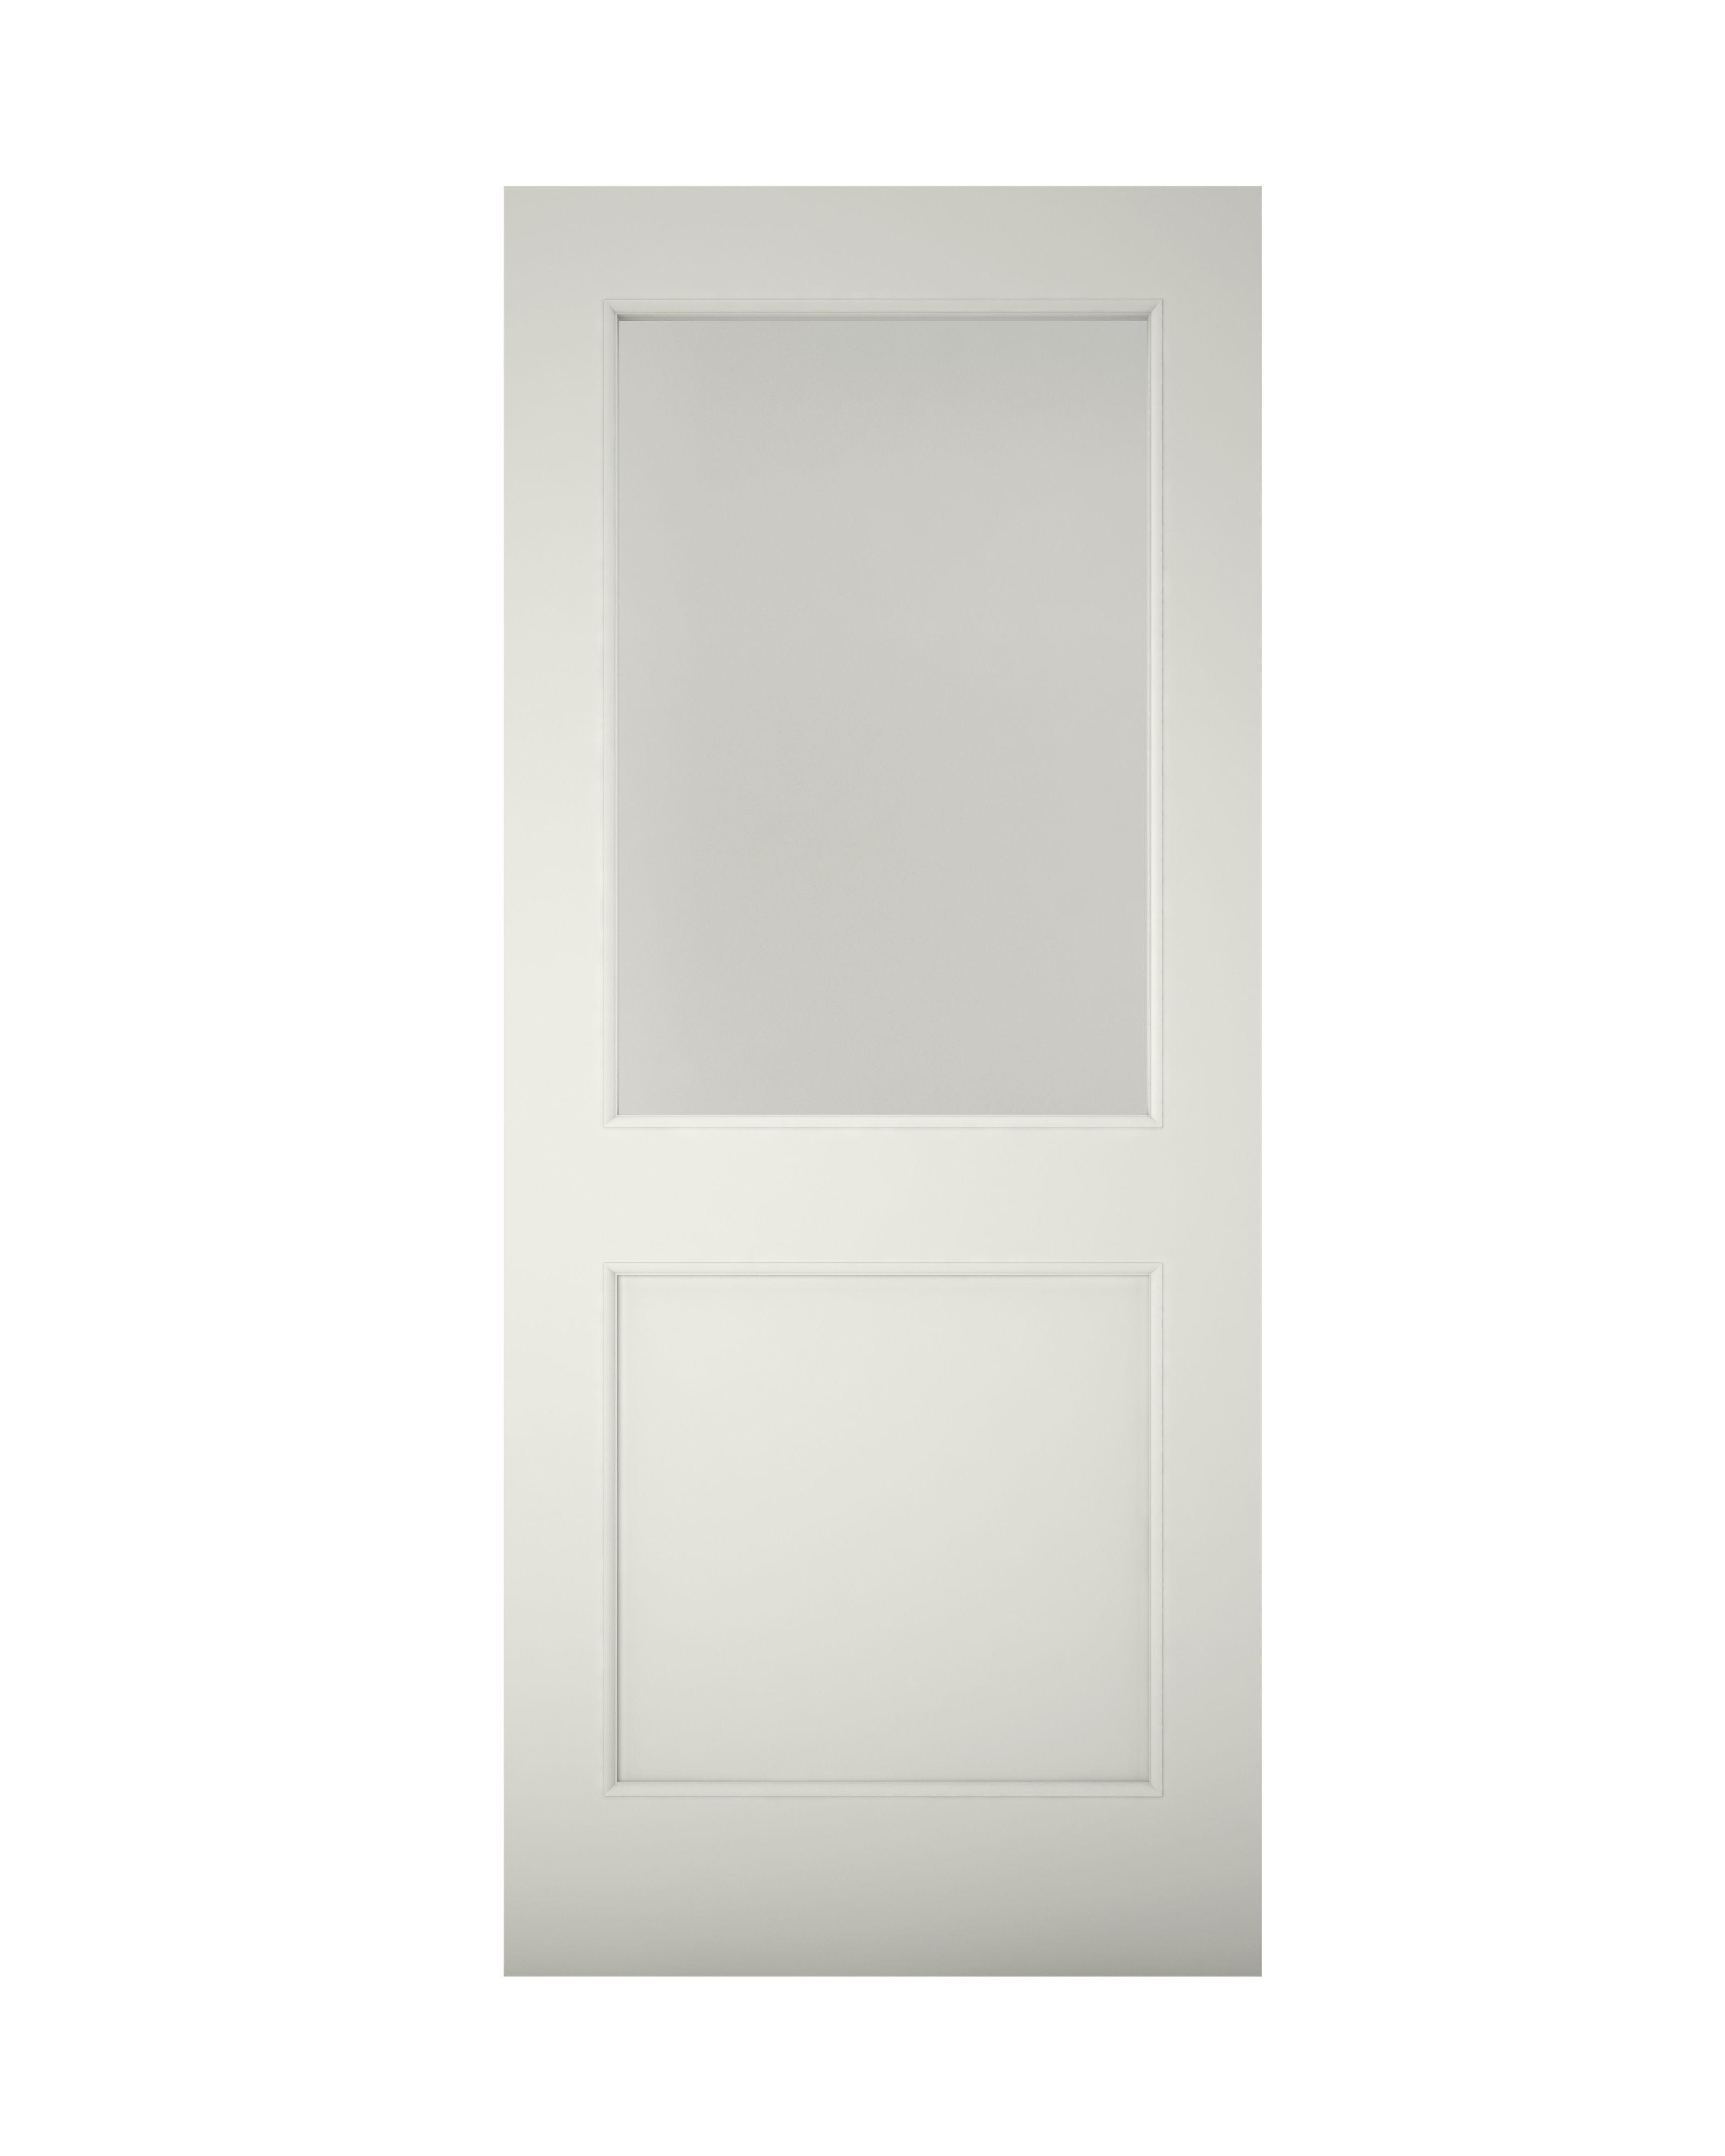 2 Panel Primed Clear Pine Veneer Timber Glazed Back Door, (h)2032mm (w)813mm